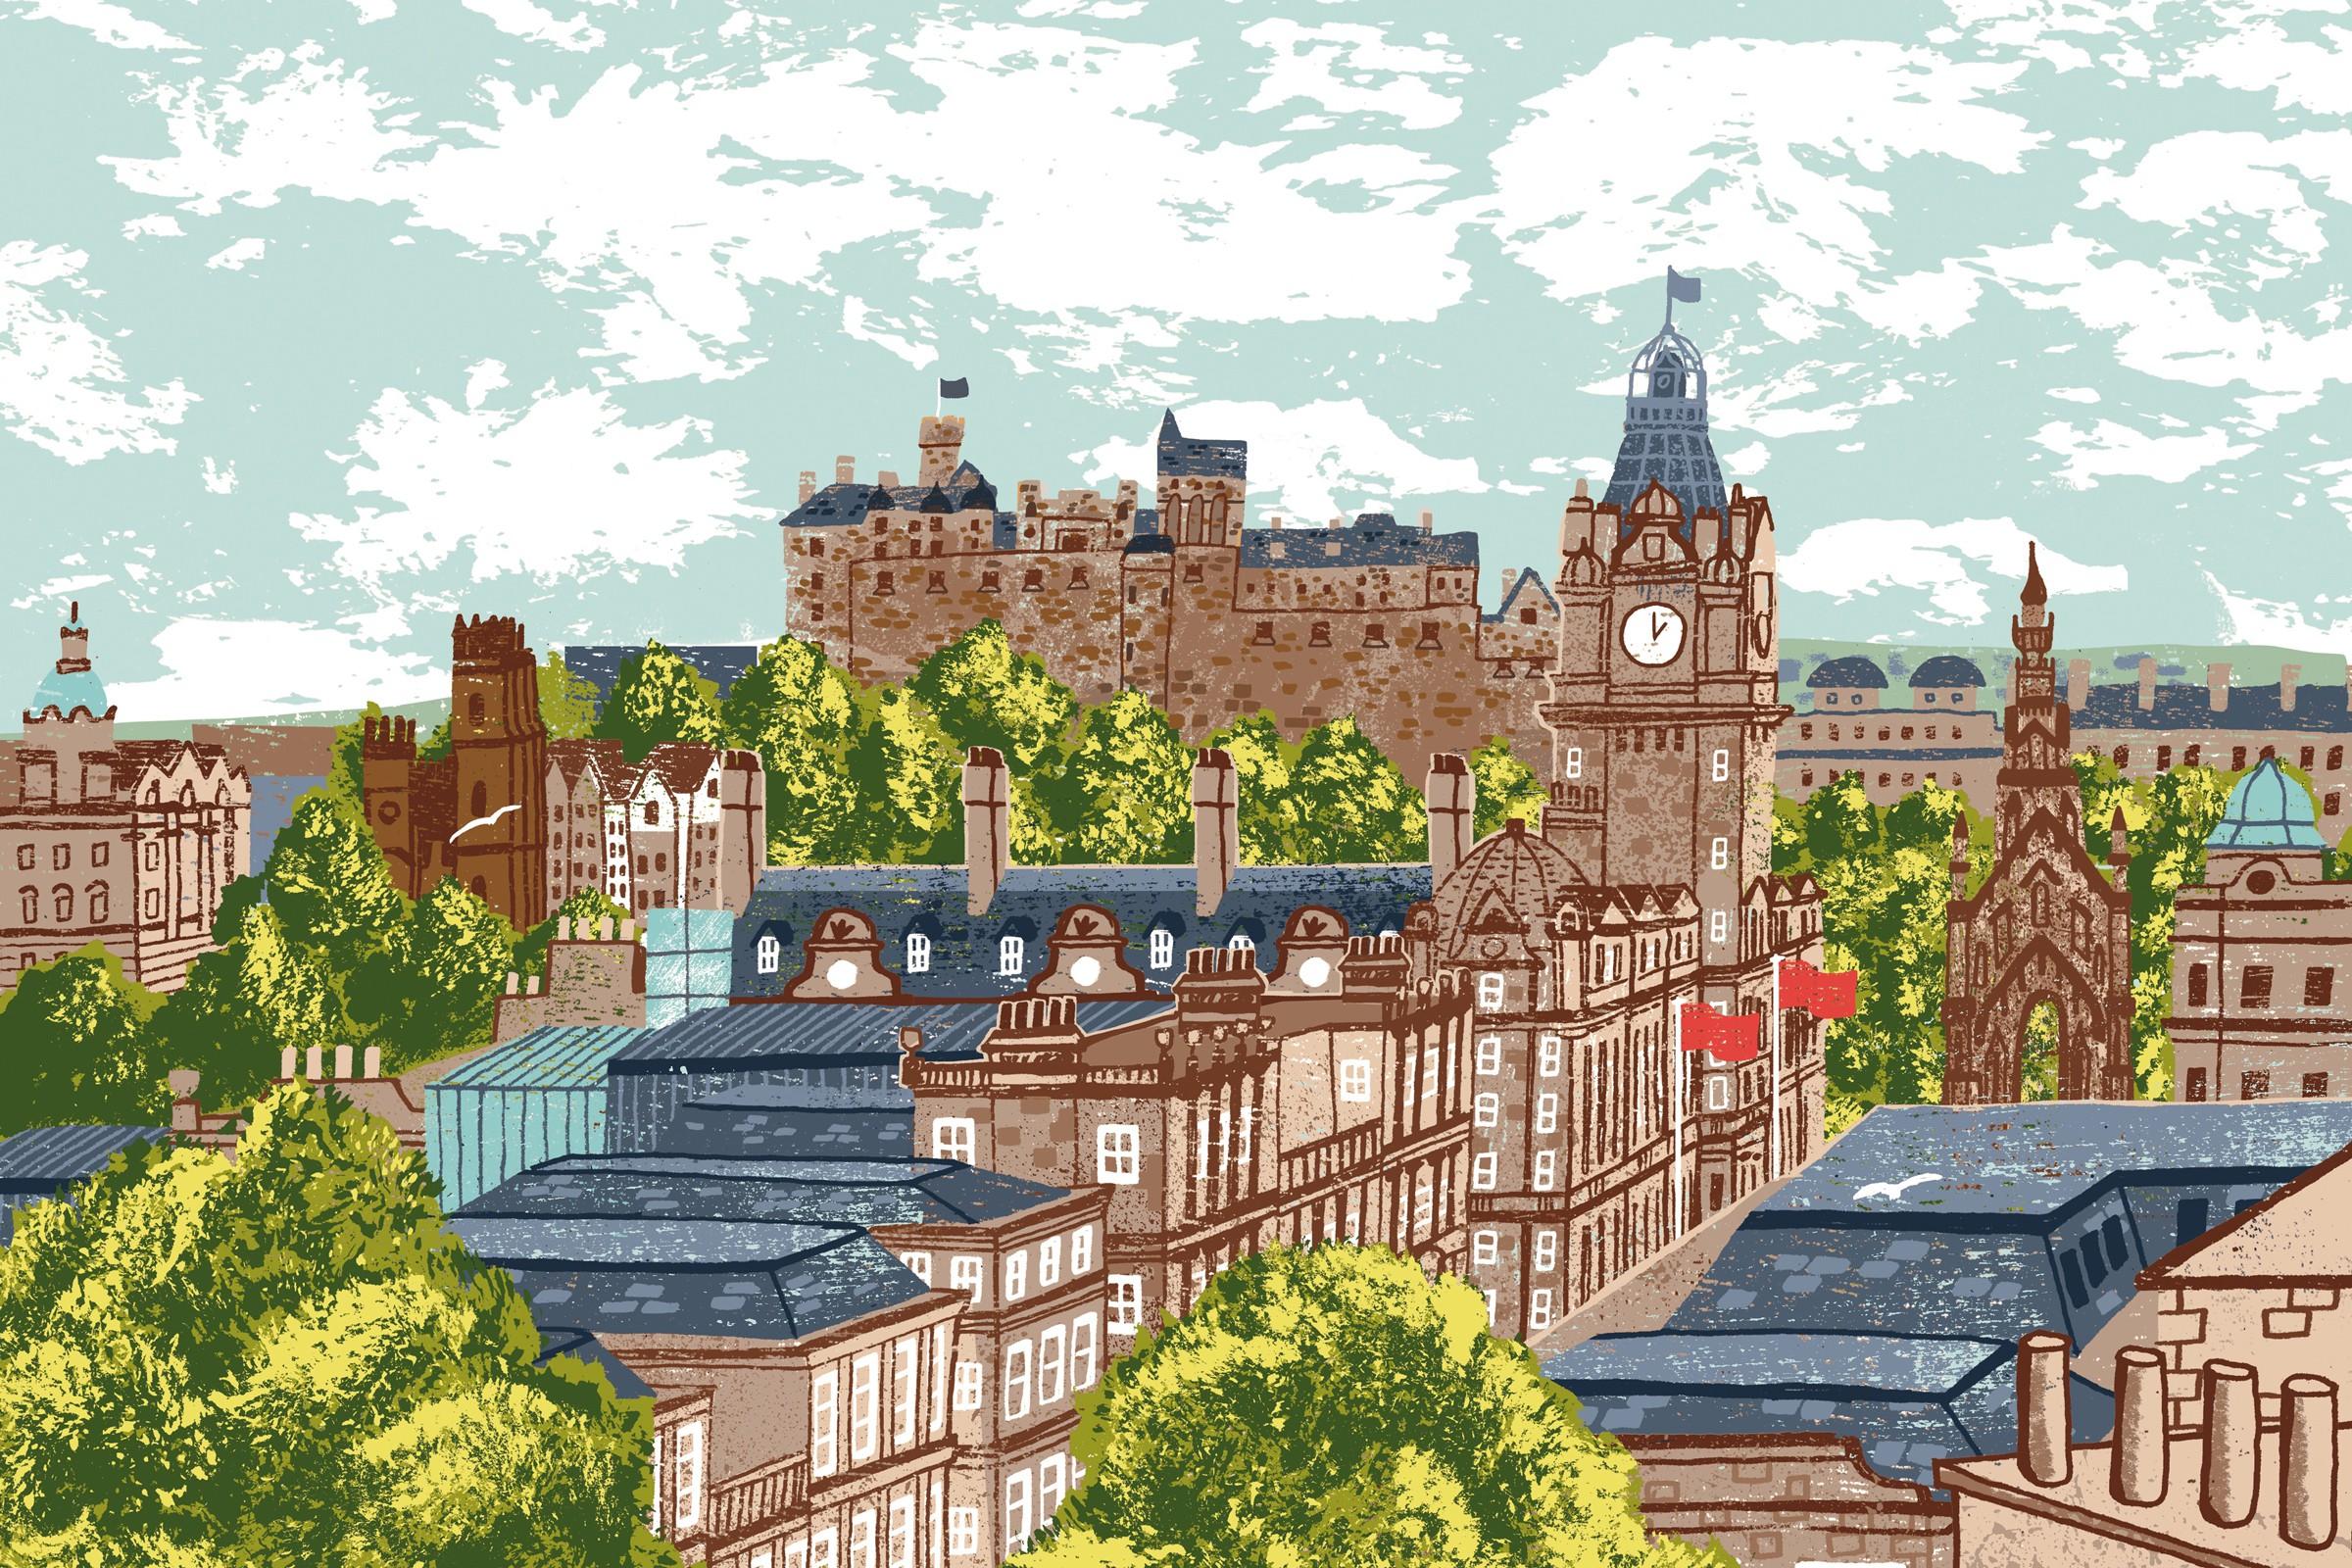 Edinburgh - Places to stay